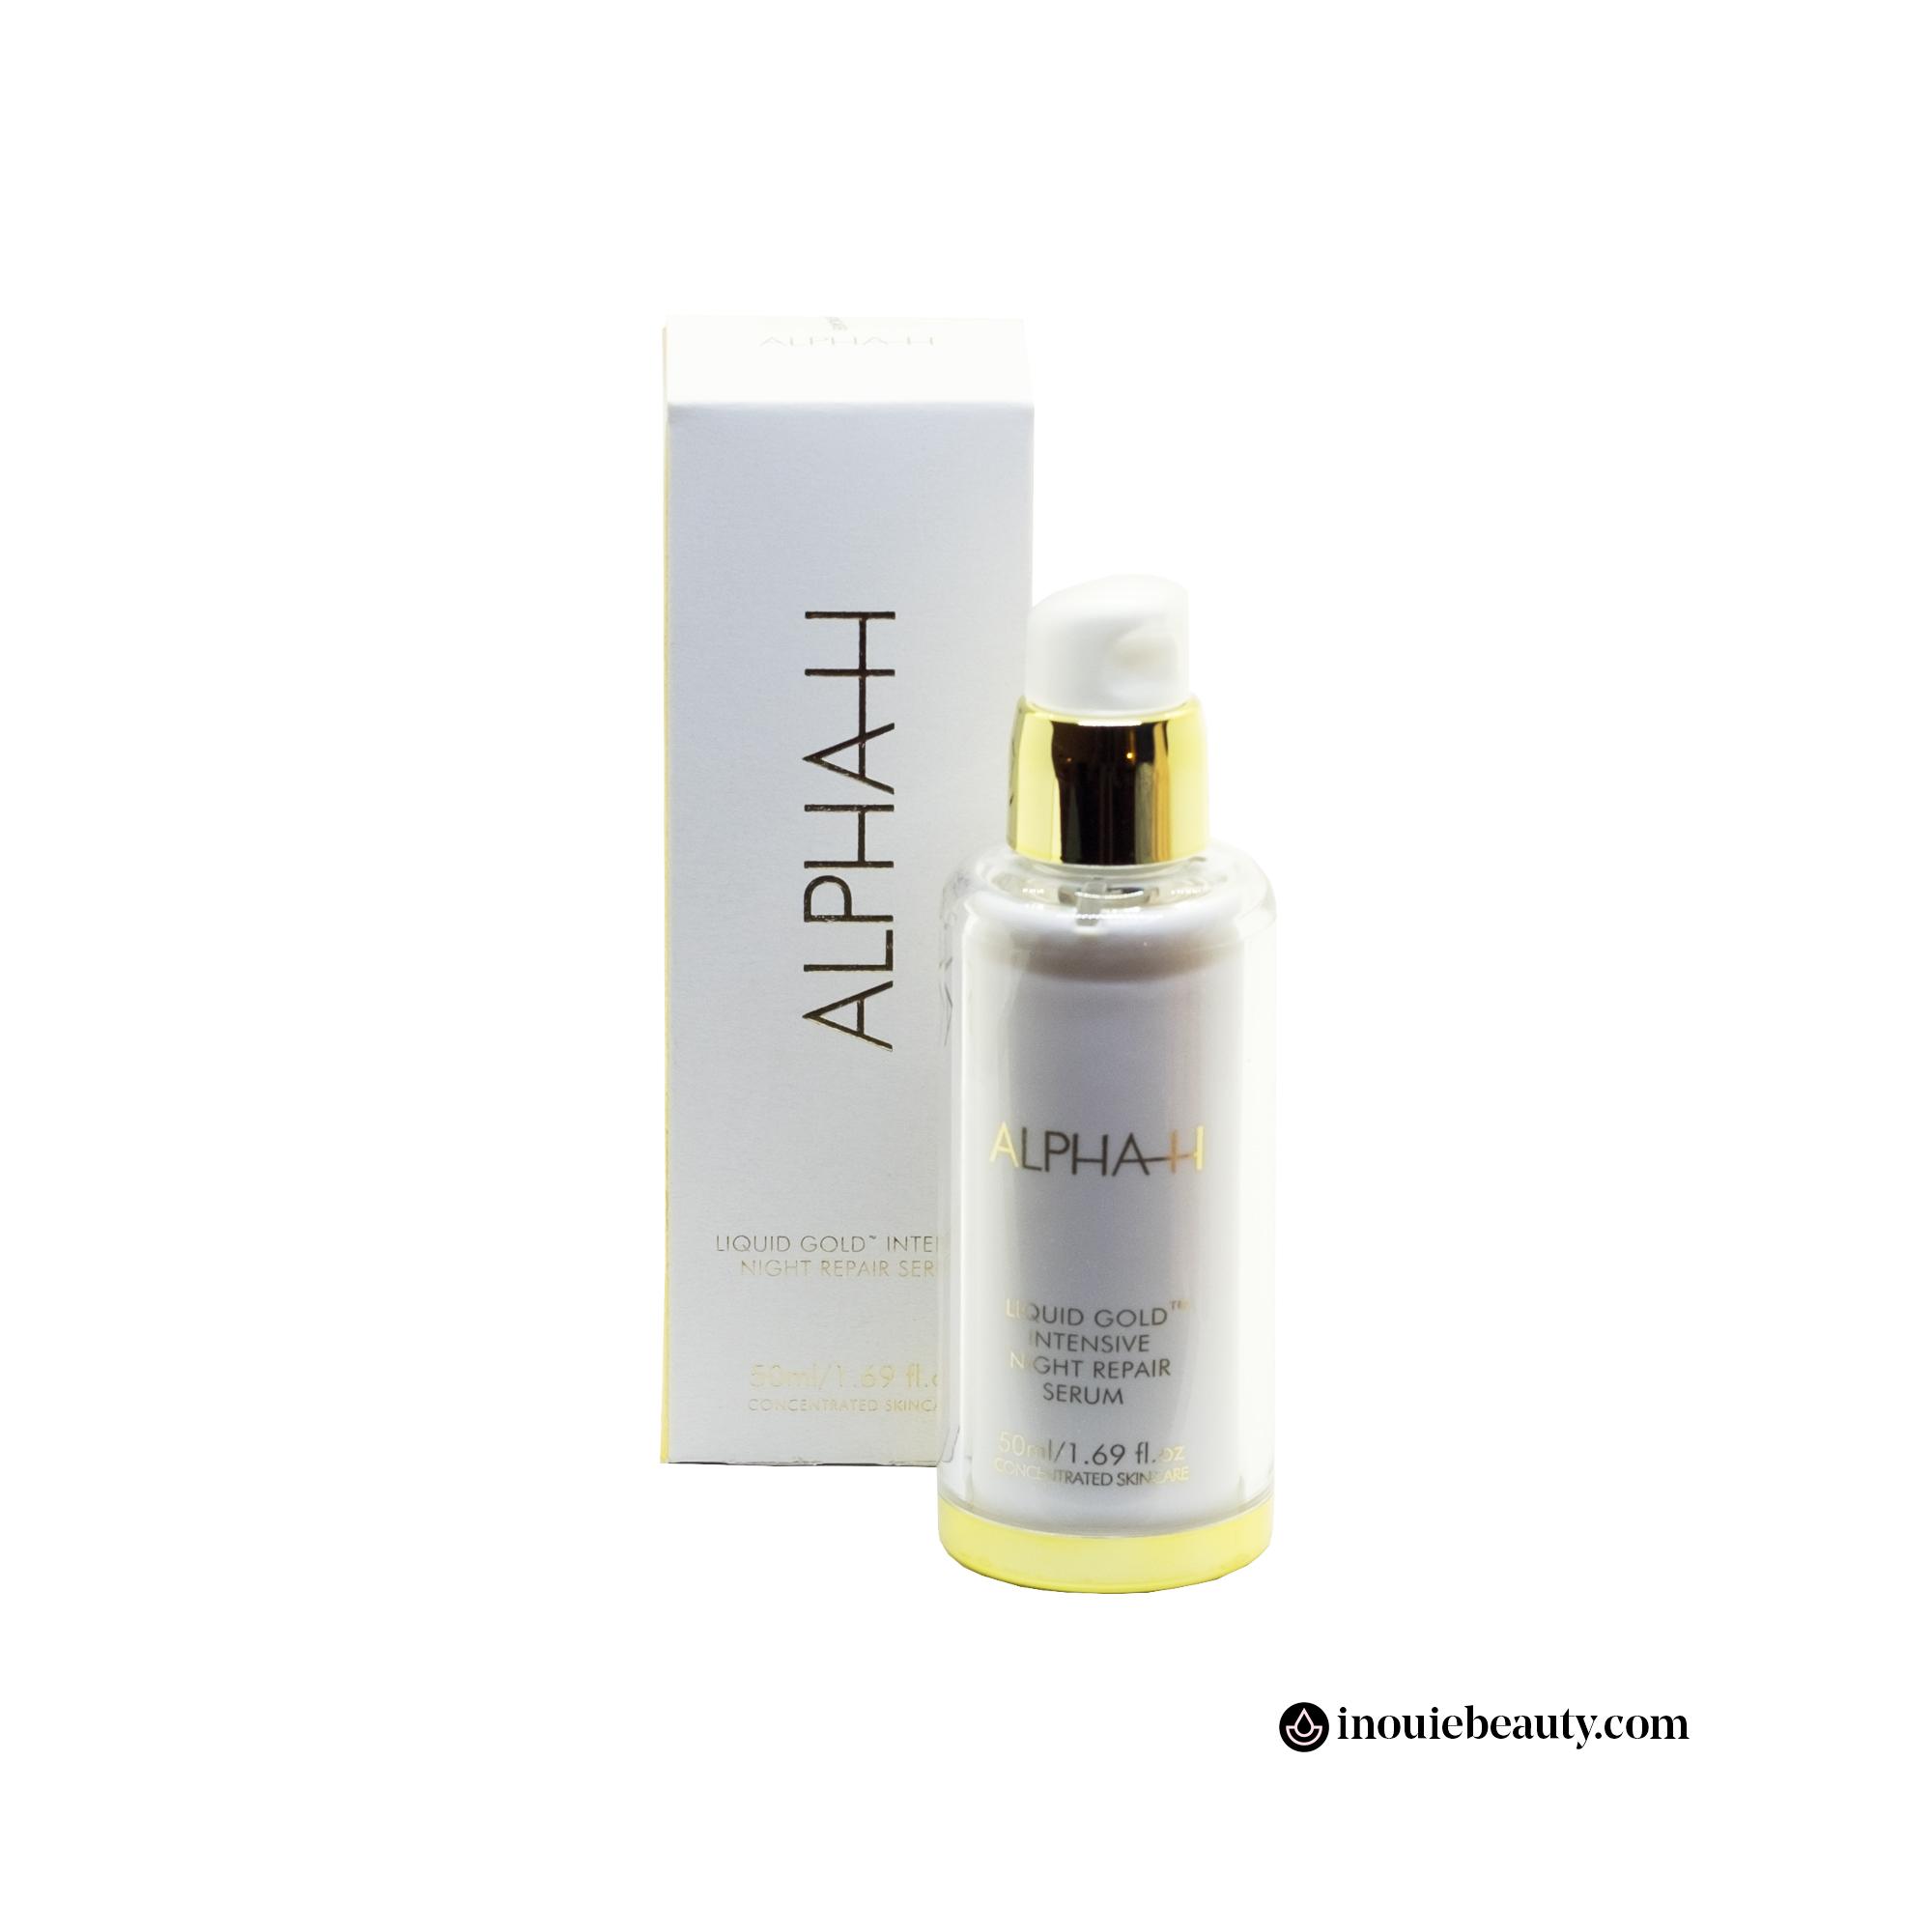 Alpha-H Liquid Gold Intensive Night Repair Serum